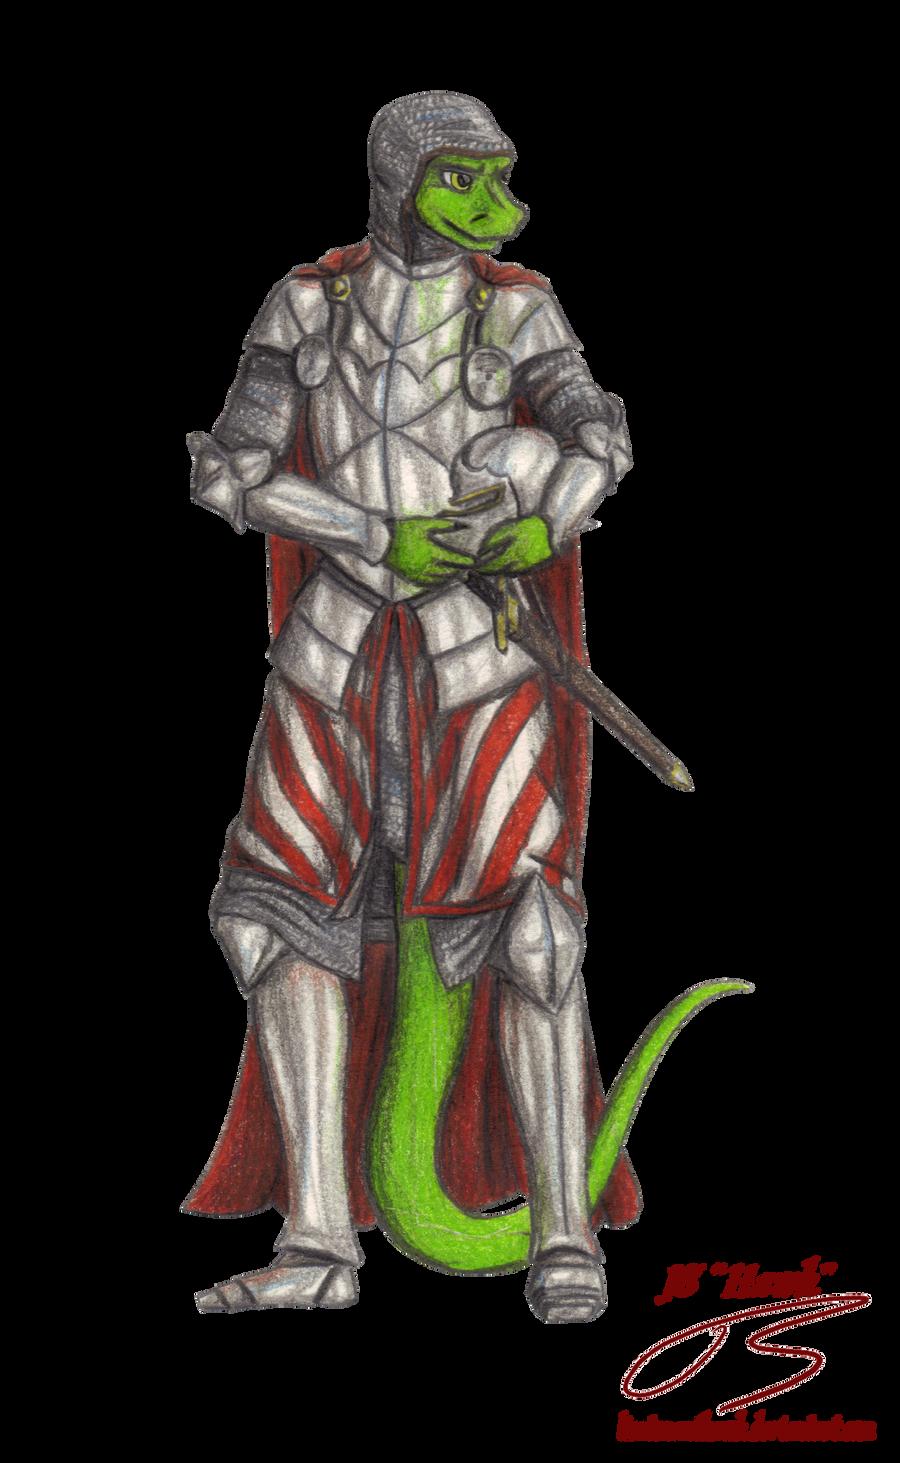 Knight-Commander Mordecius by LieutenantHawk